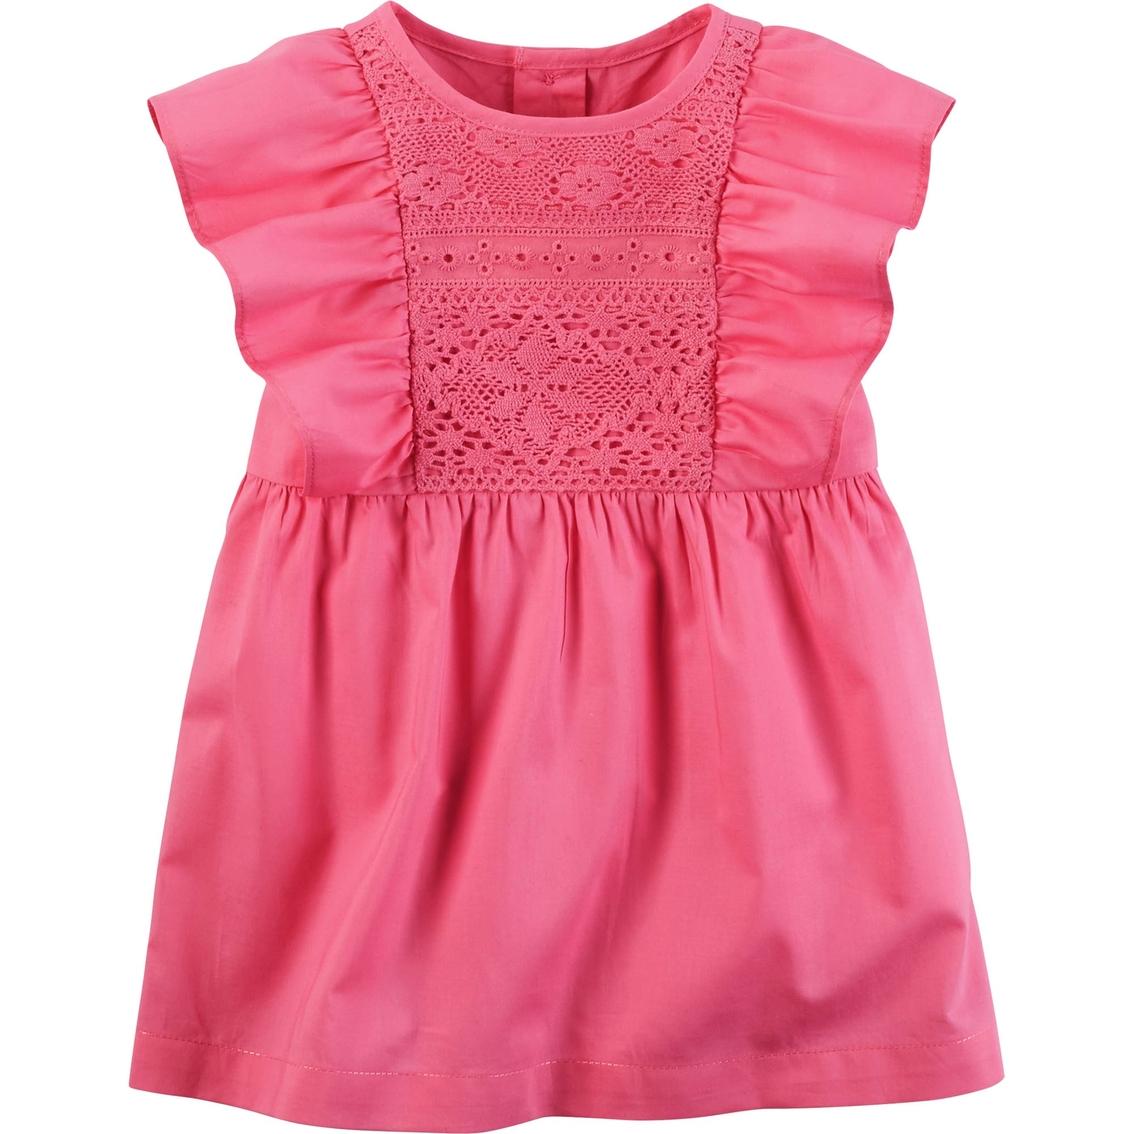 a2a42c7eb Carter's Infant Girls Ruffle Sleeve Dress   Baby Girl 0-24 Months ...